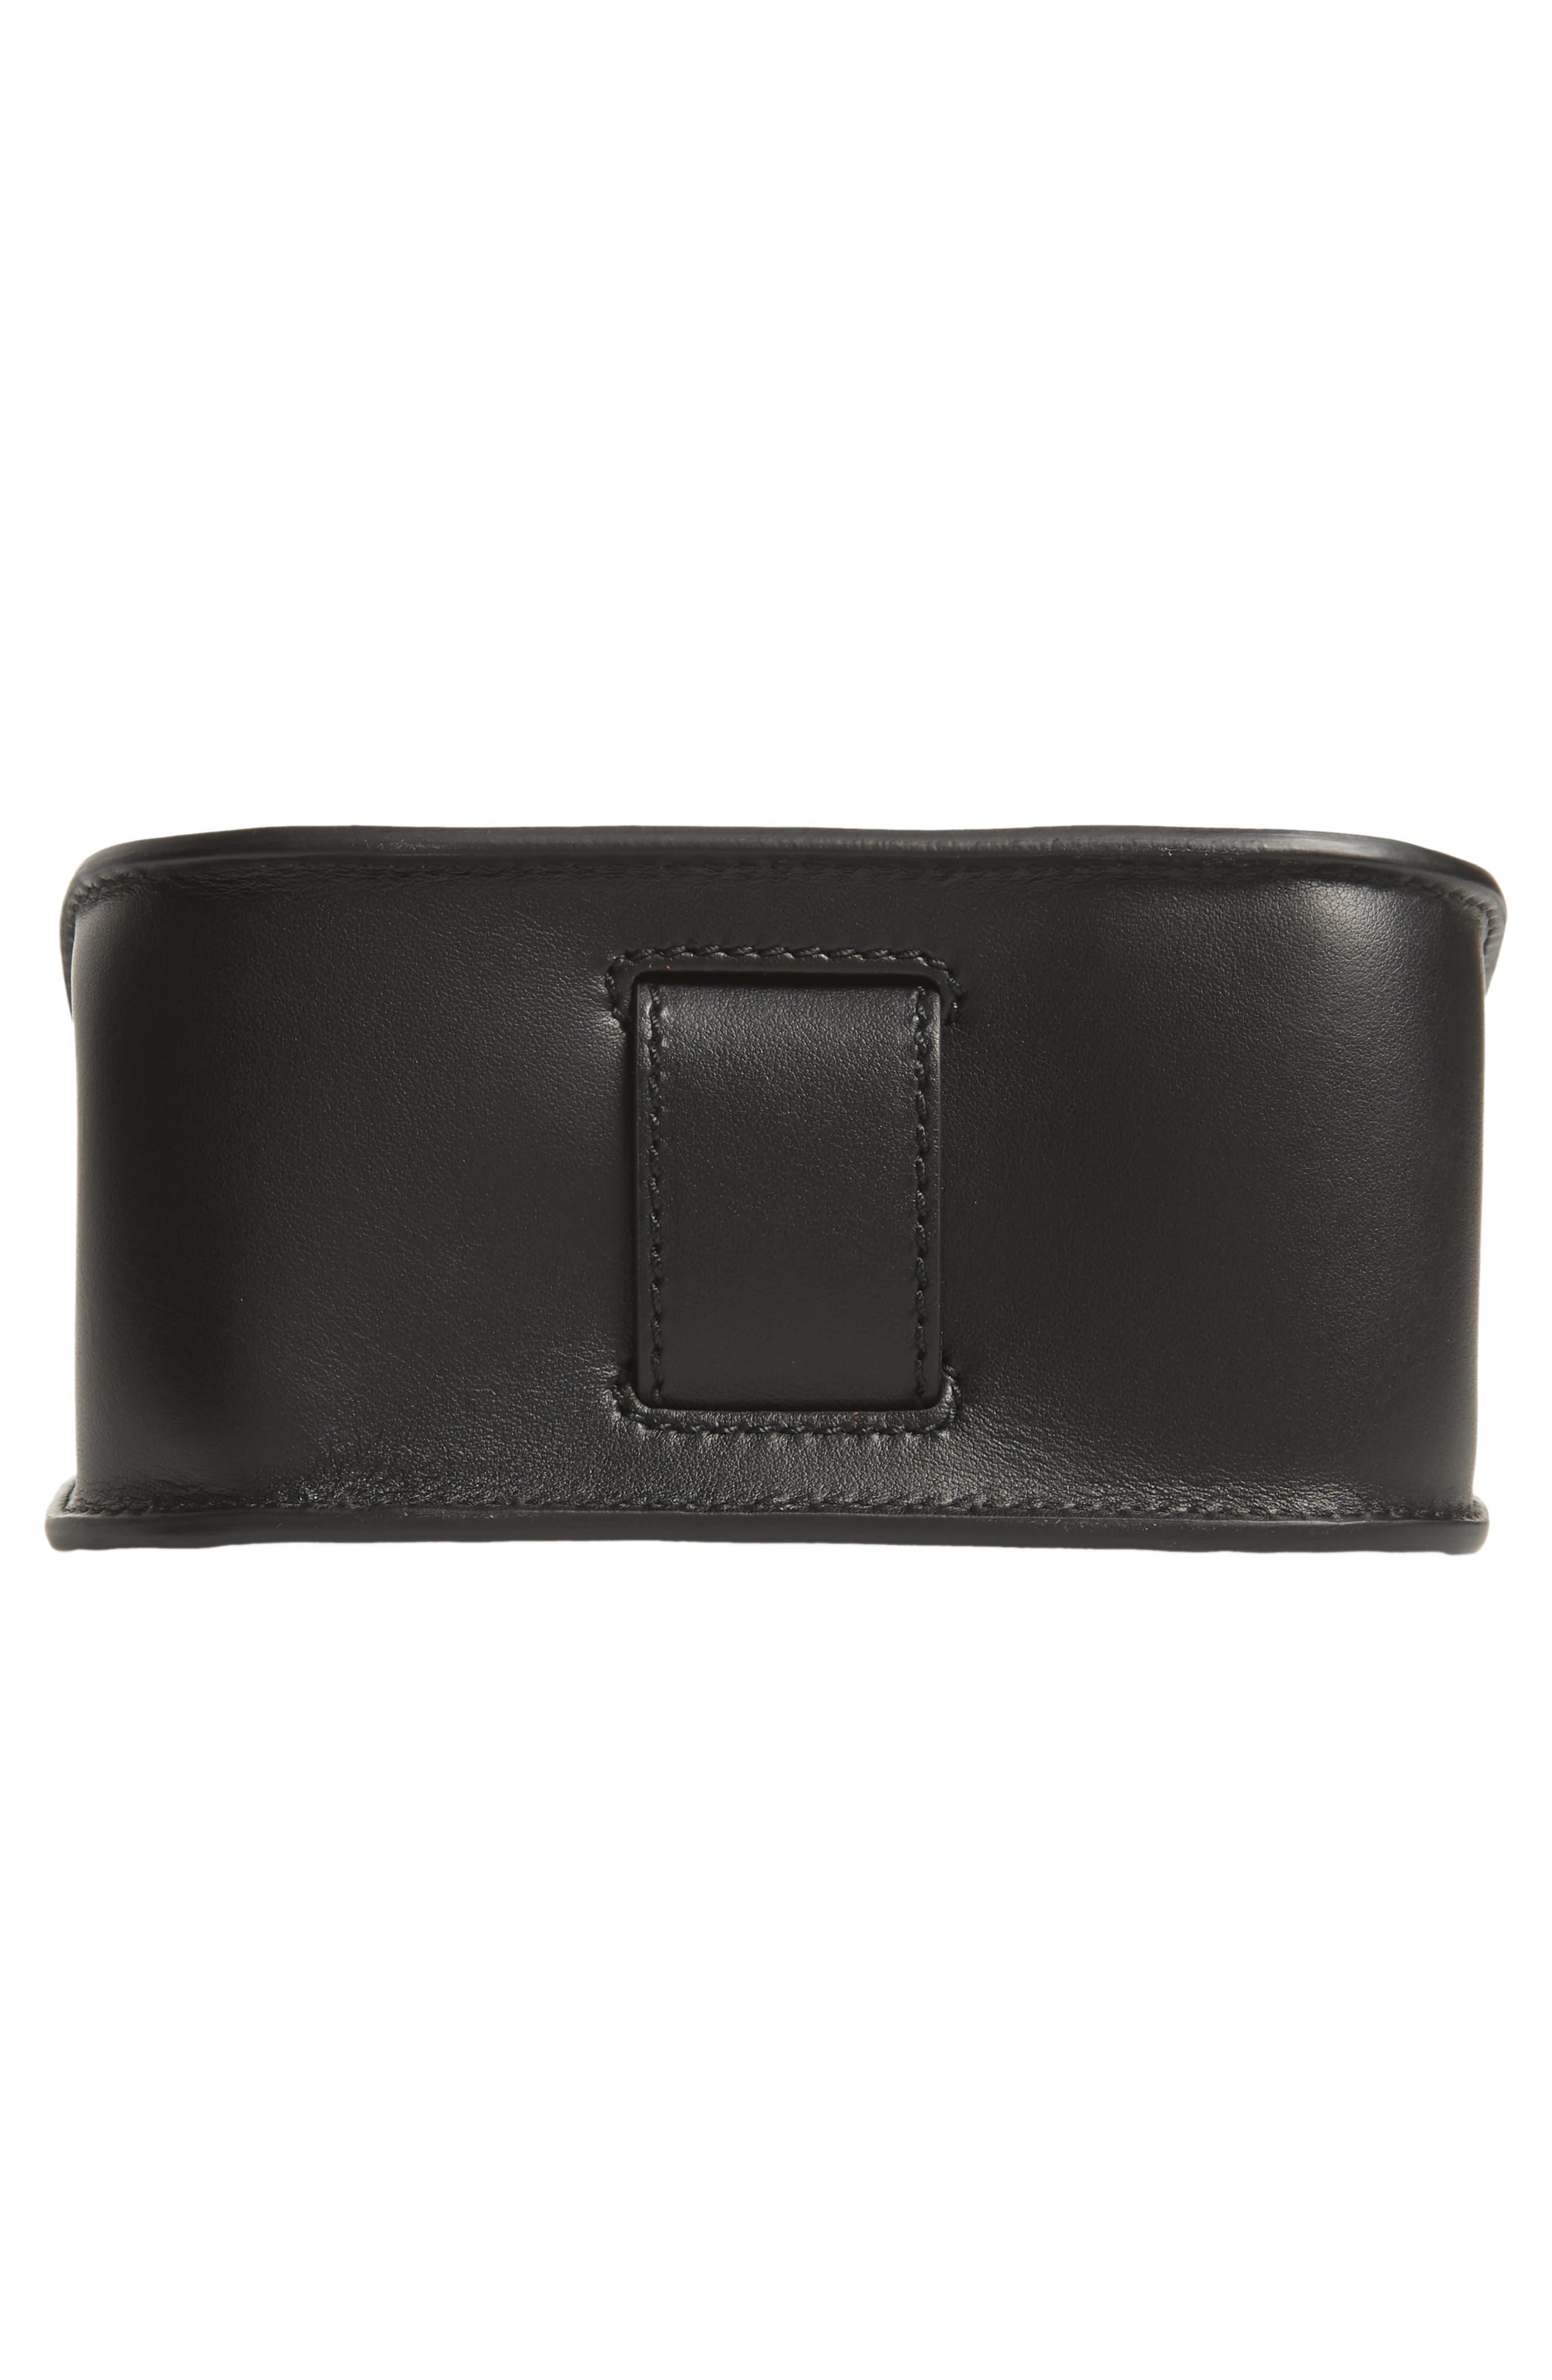 PS11 Box Leather Crossbody Bag,                             Alternate thumbnail 6, color,                             BLACK